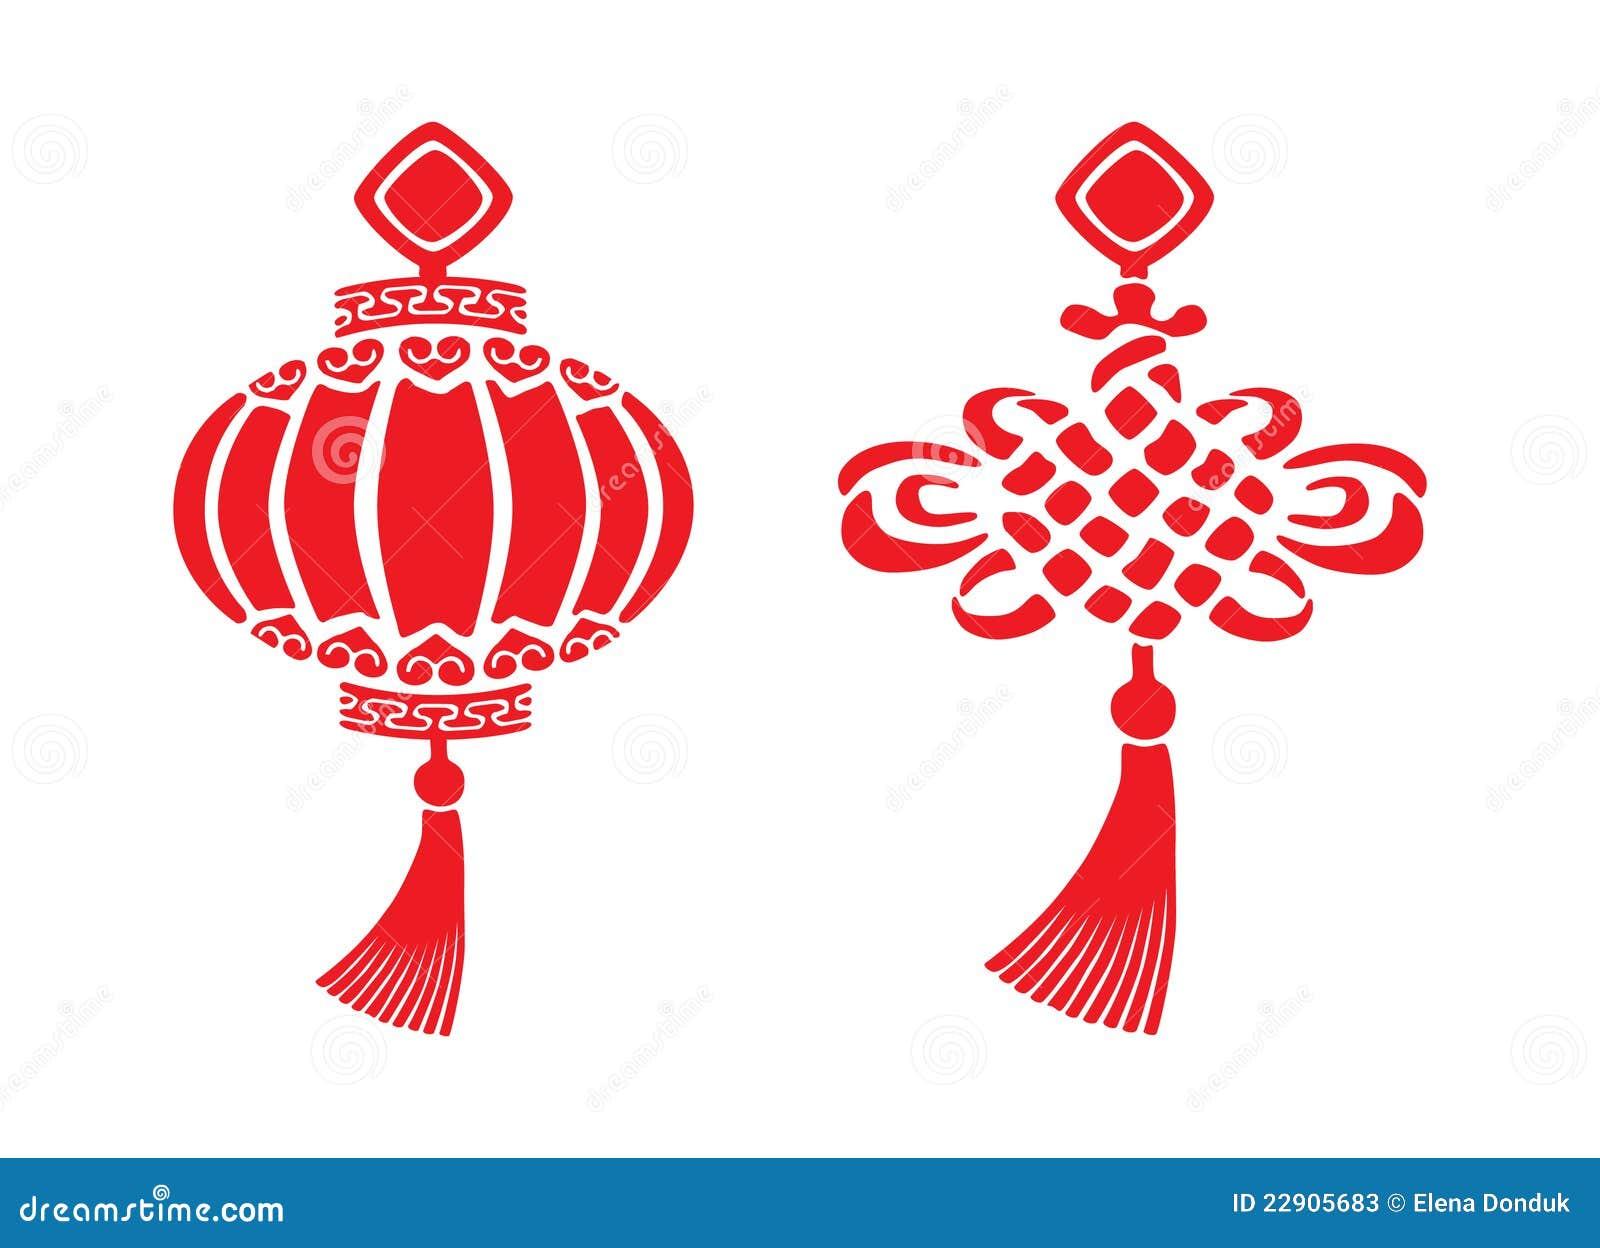 Chinese New Year Symbols Stock Vector Illustration Of Decoration